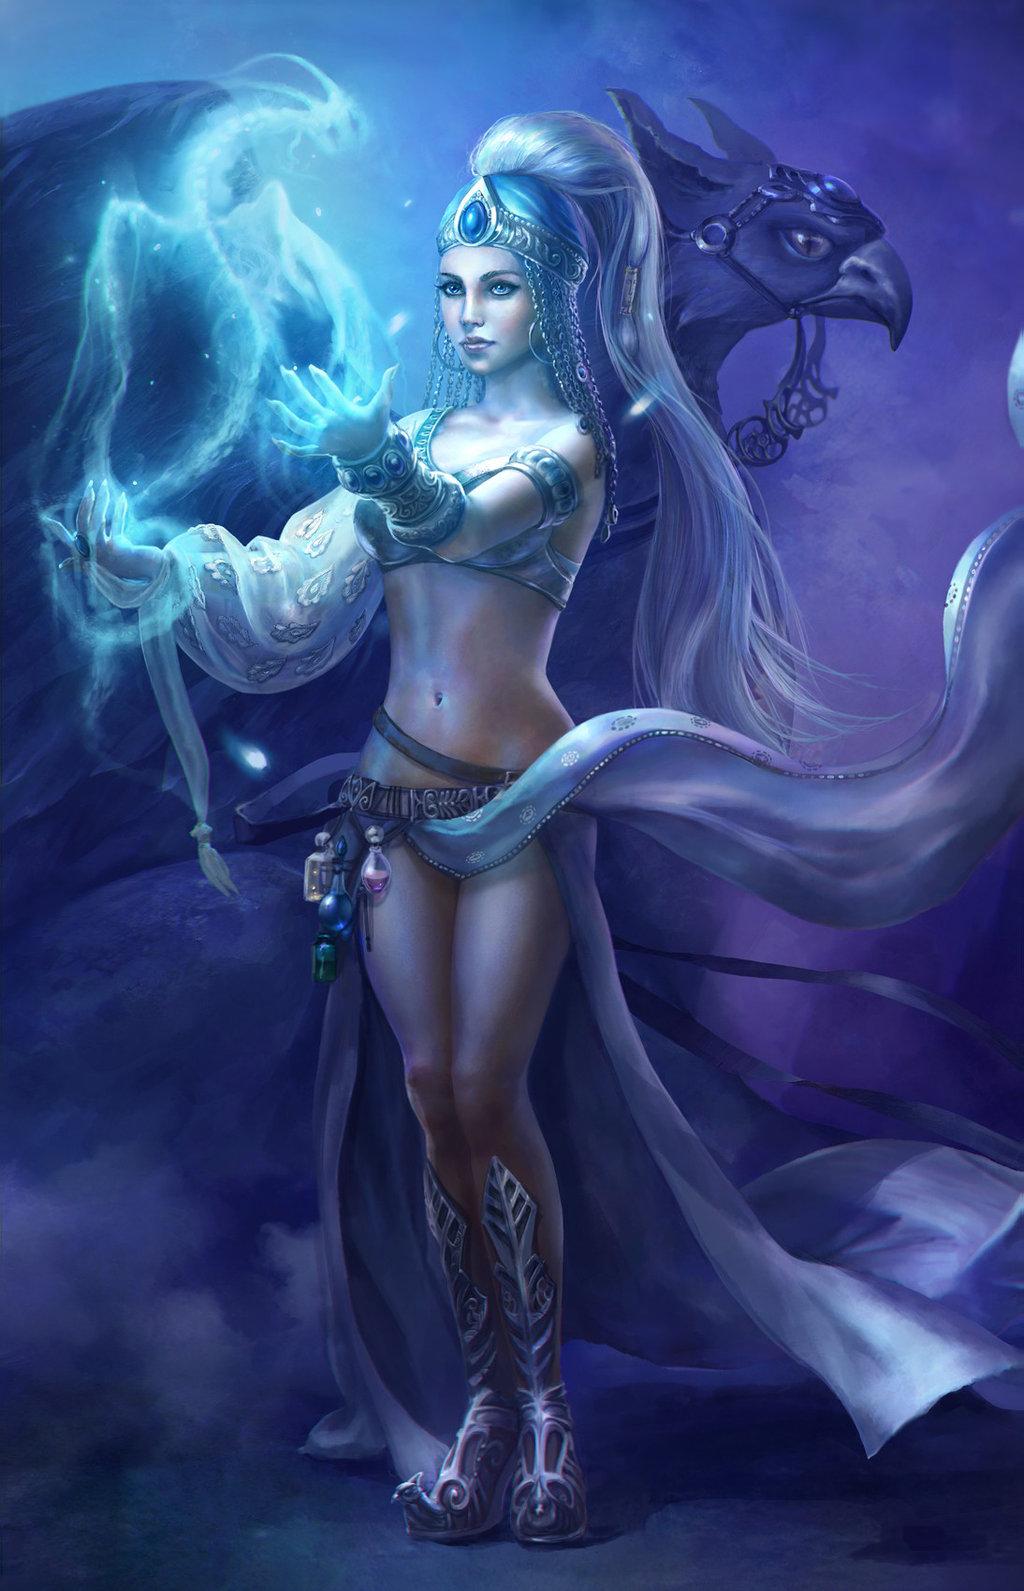 Fantasy enchantress